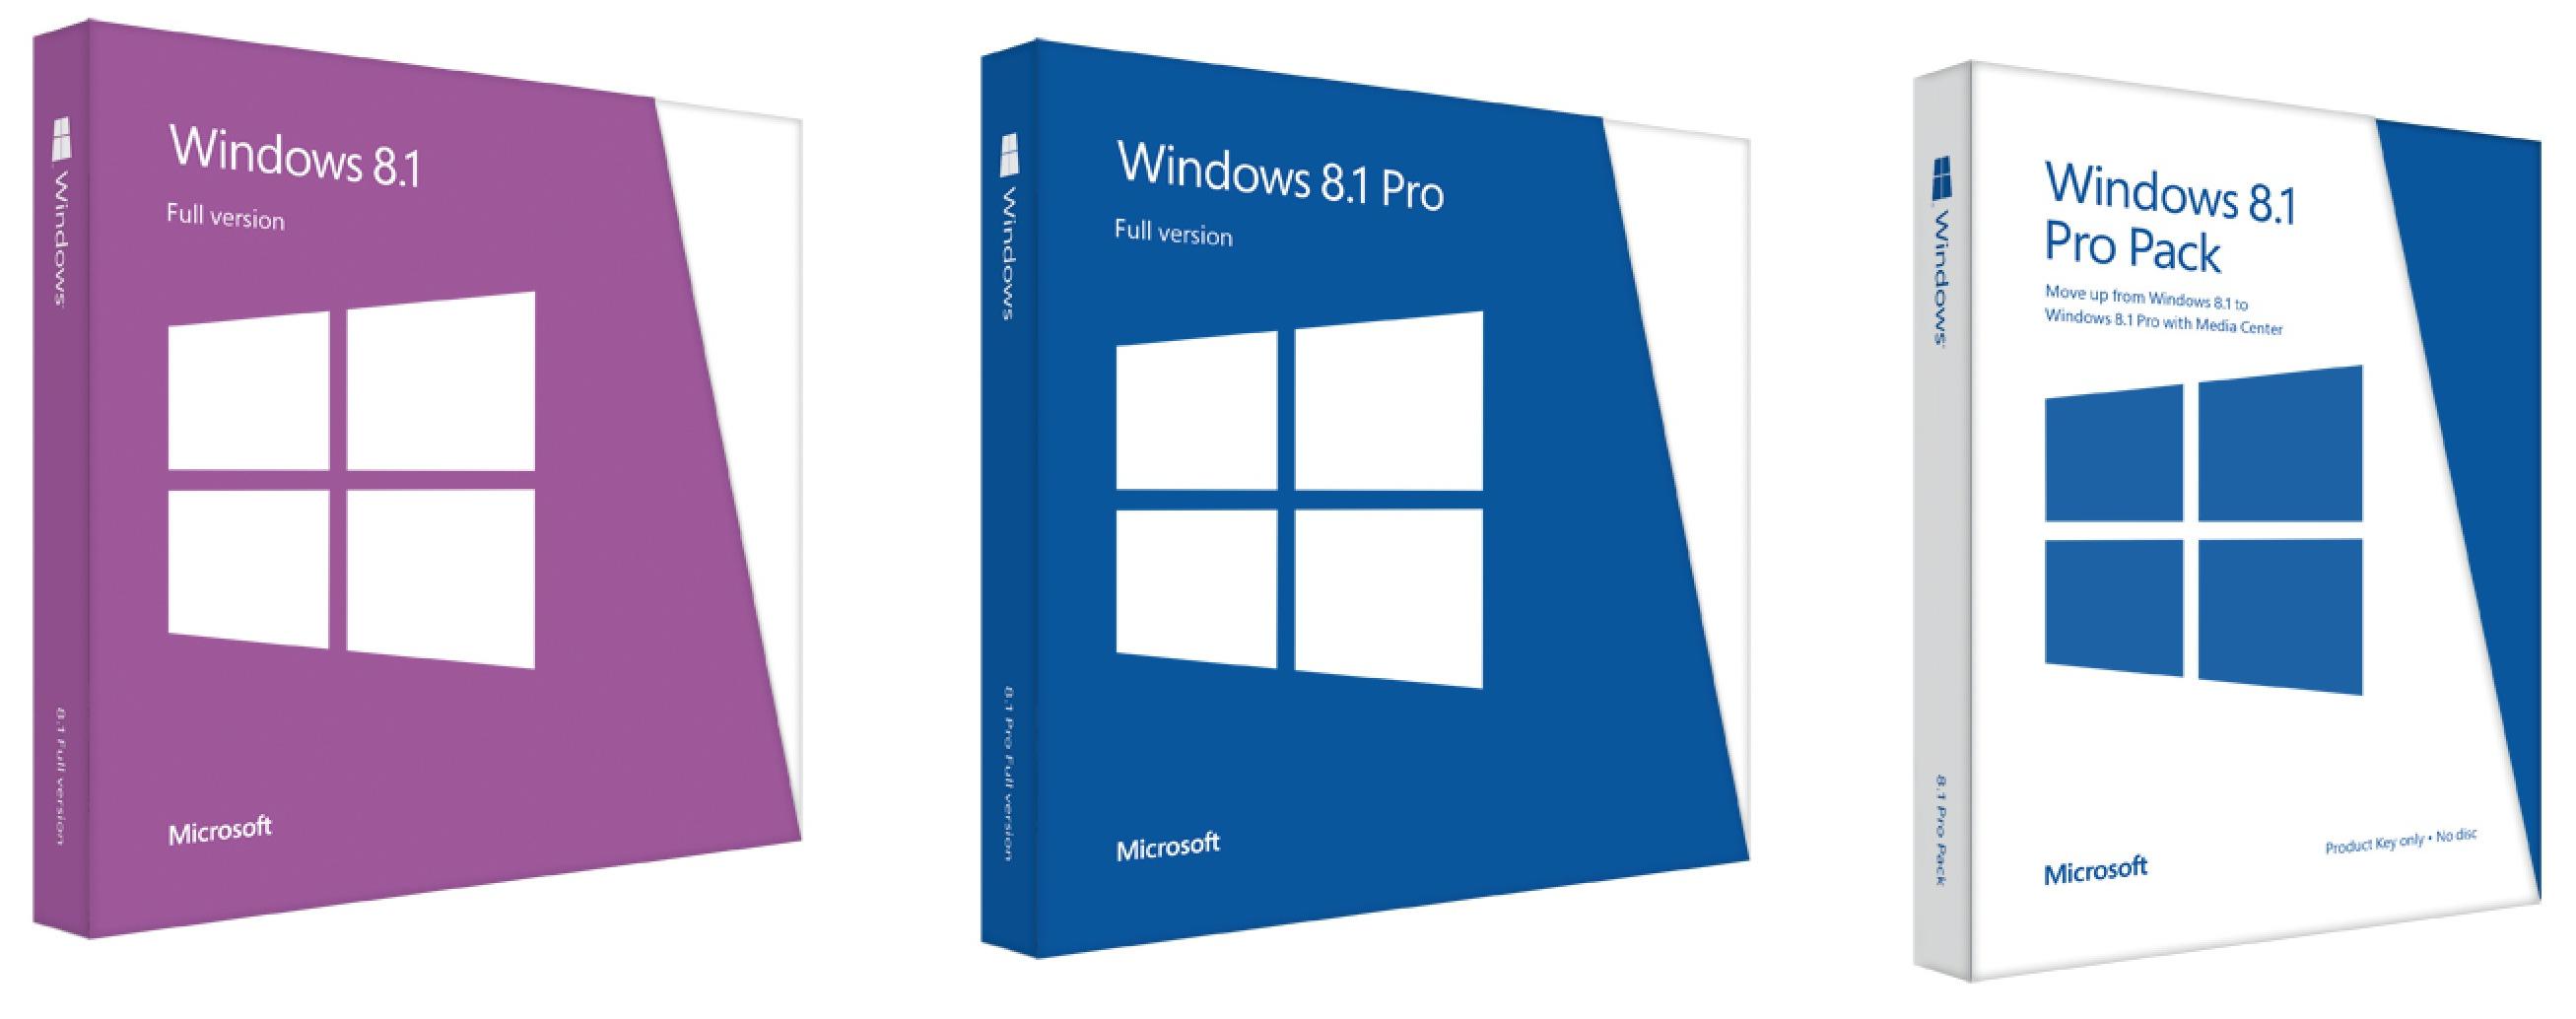 windows 8.1 pro media center pack